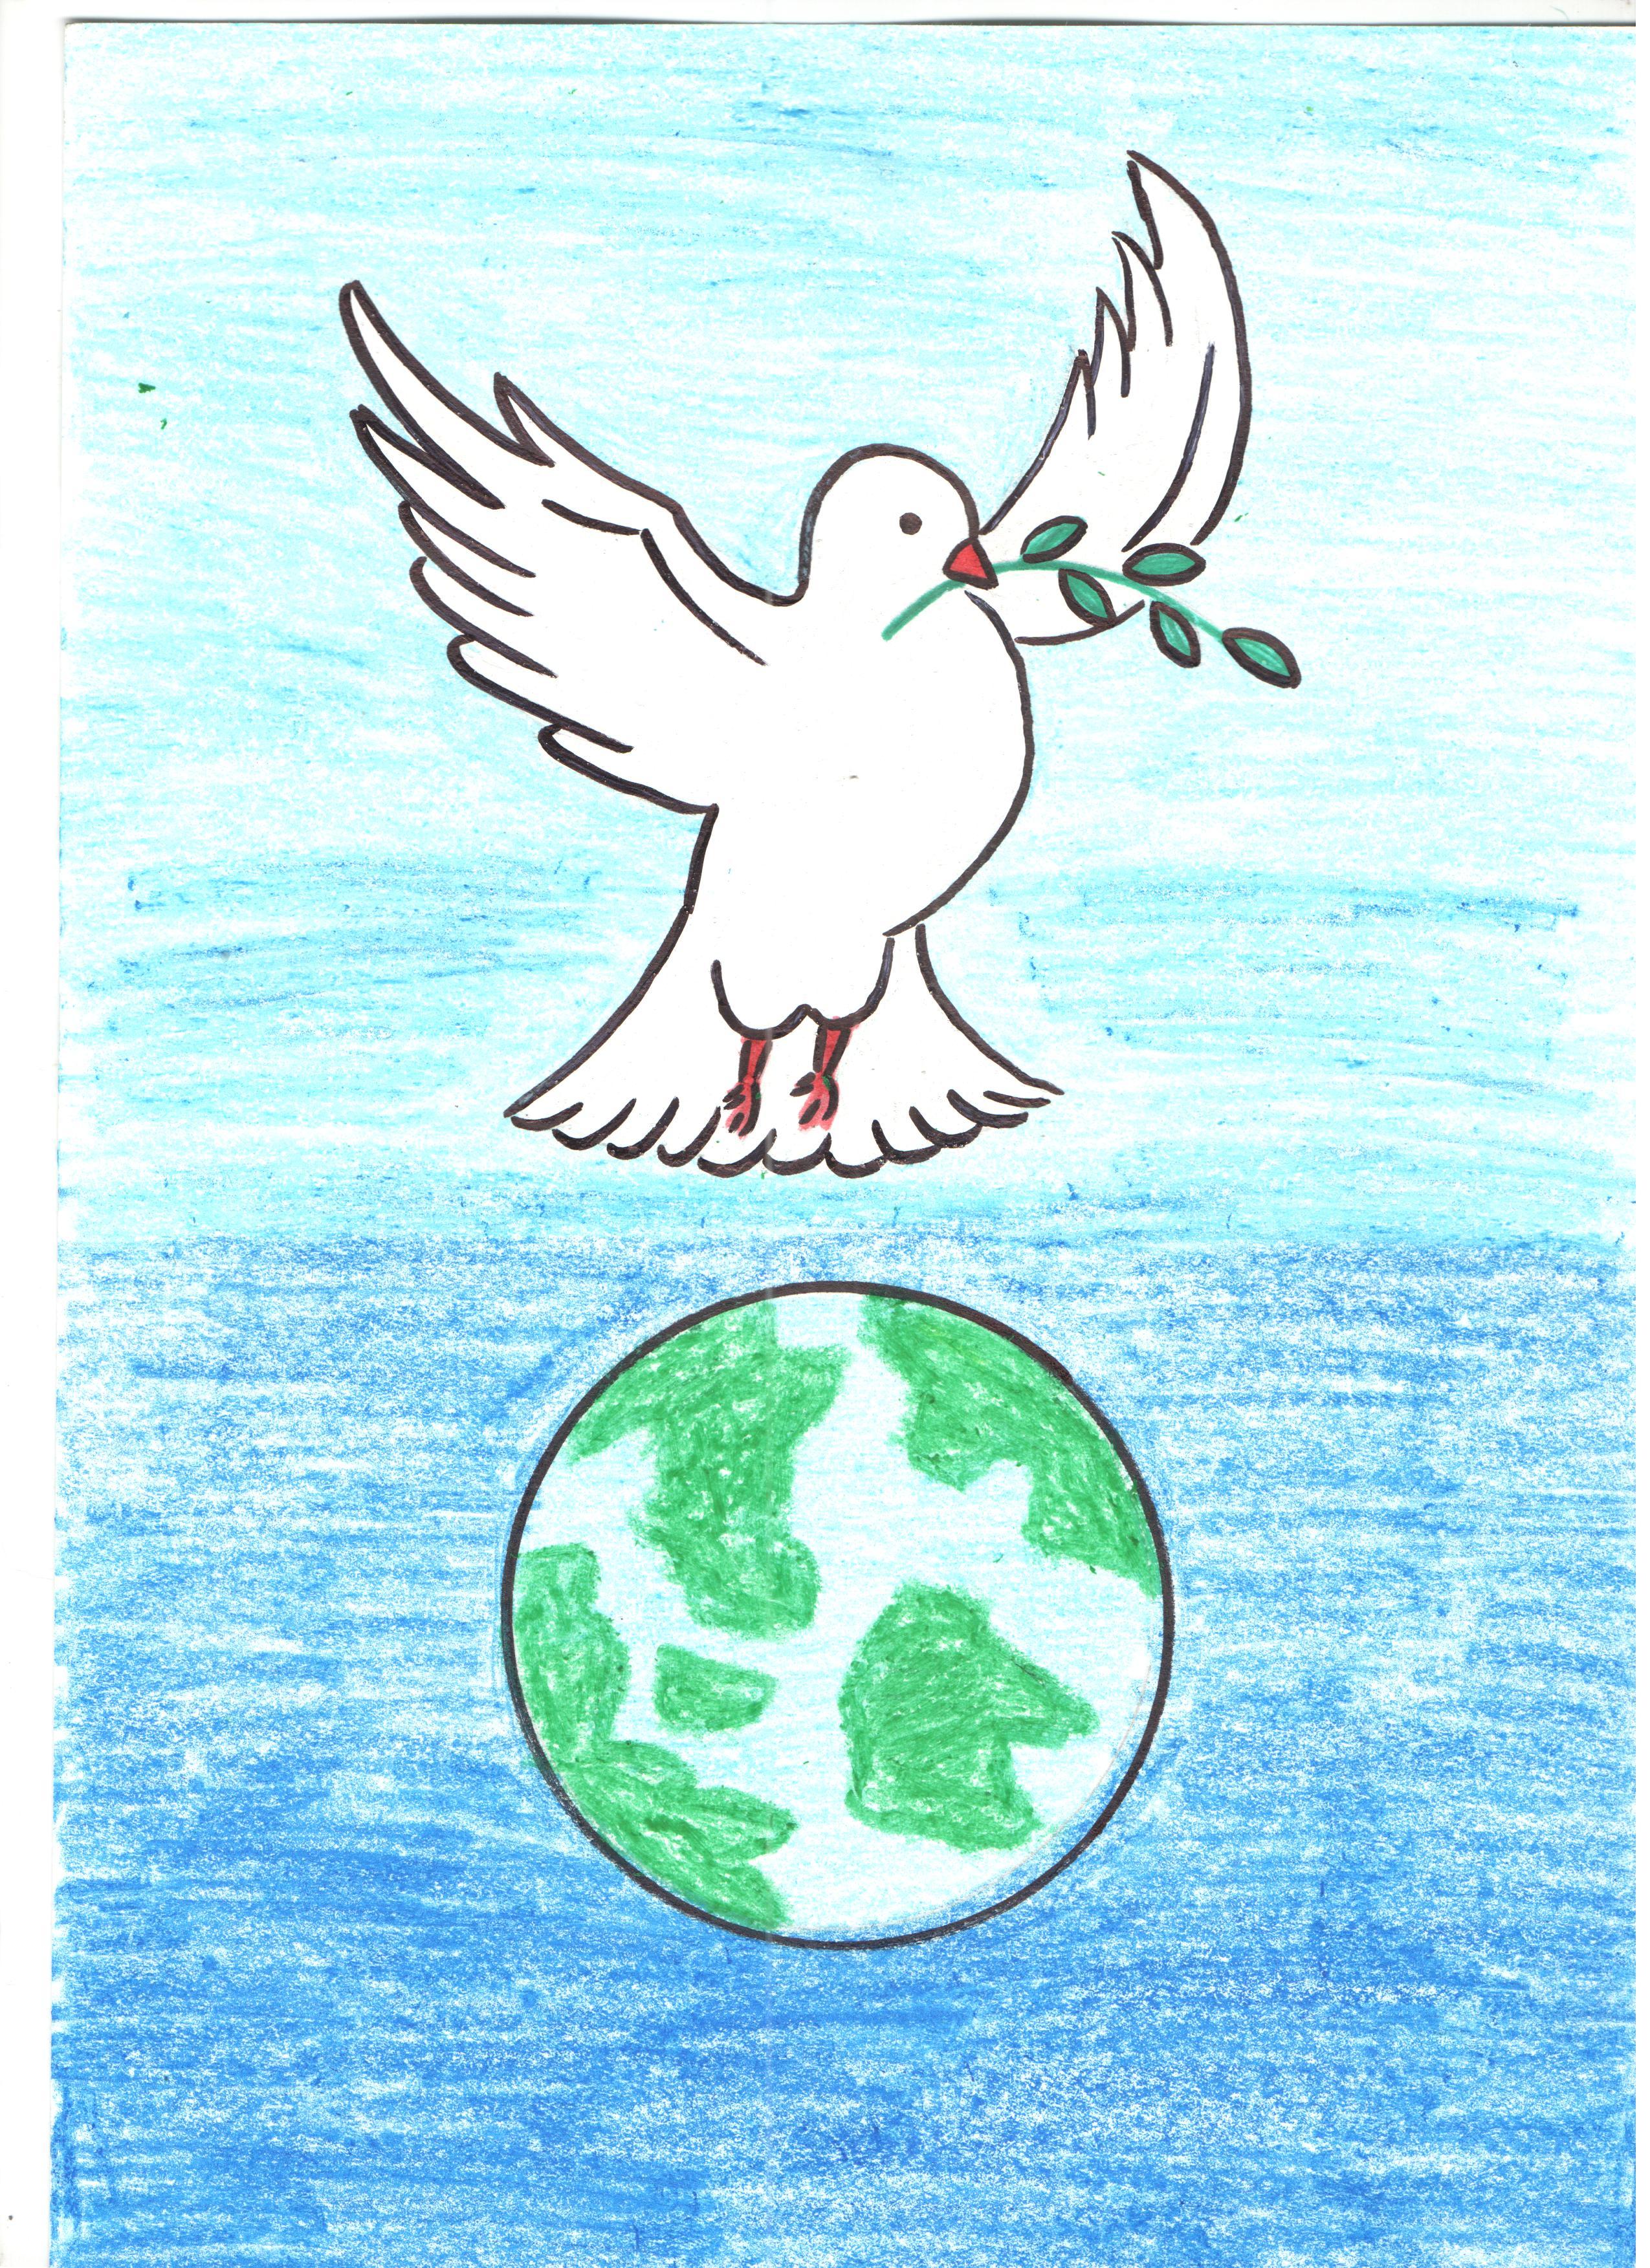 Картинки Мир за мир во всем мире   подборка фото (11)